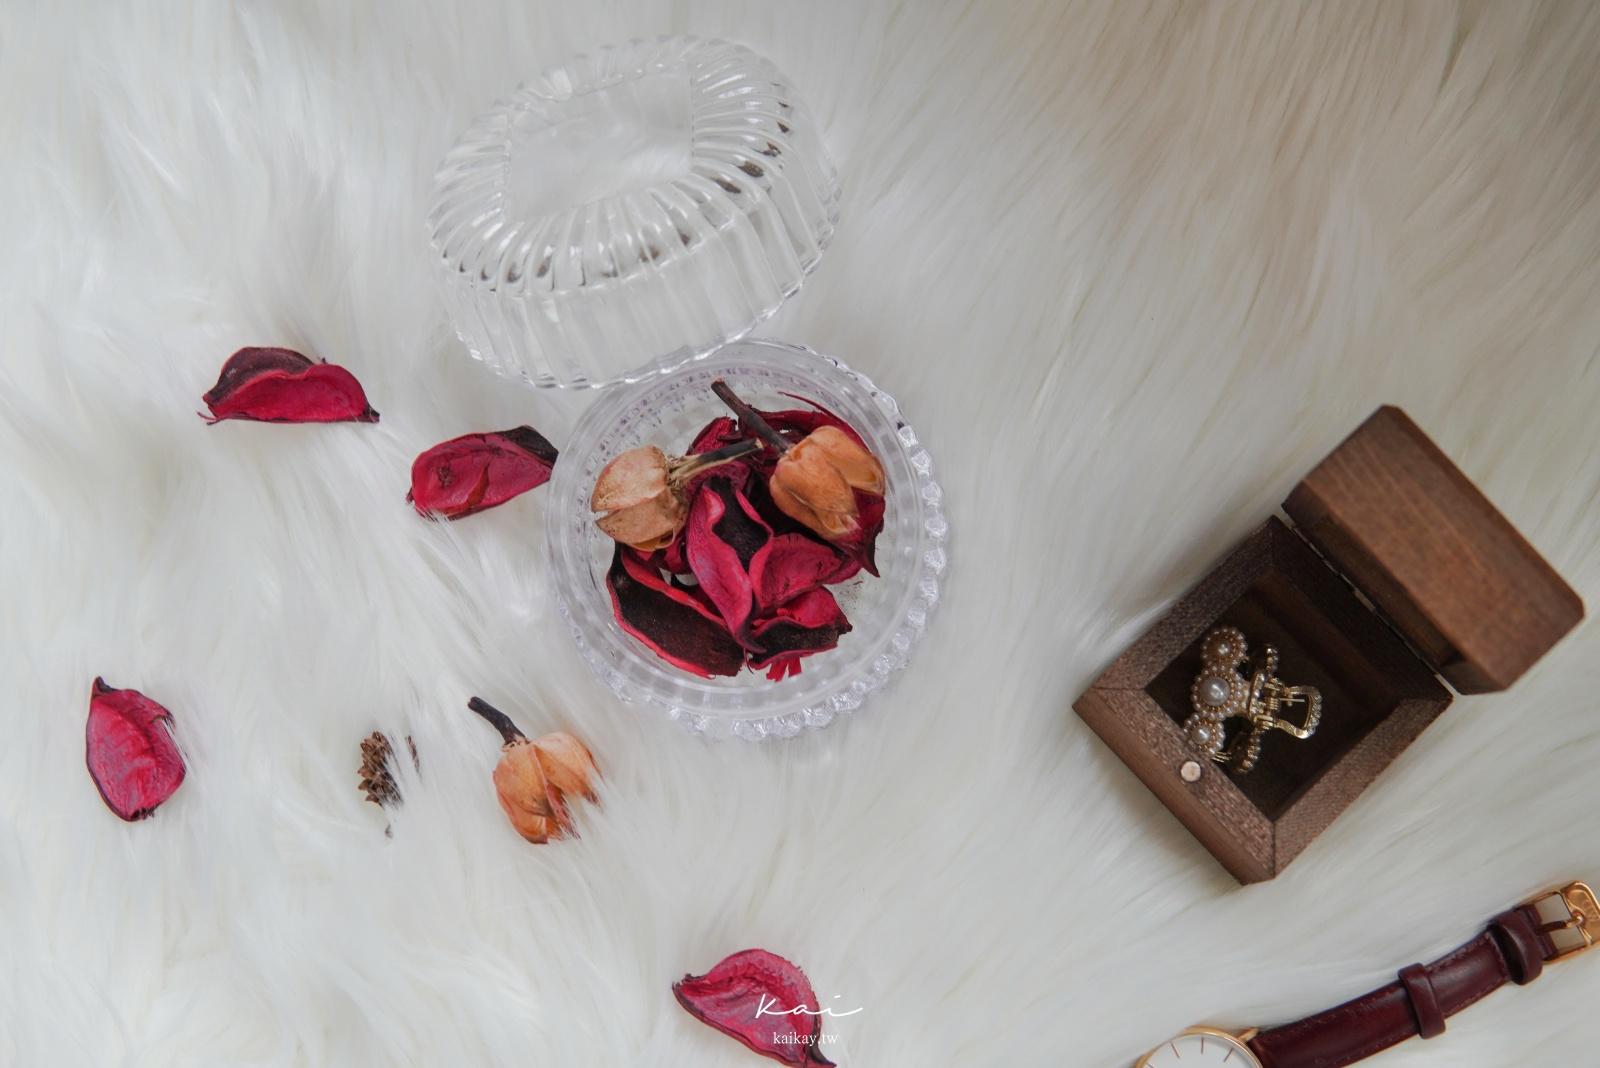 "☆【Natural Kitchen 】2021二月過年限定、「透明系」玻璃餐具系列。Natural Kitchen 實""逛""轉播+戰利品開箱"